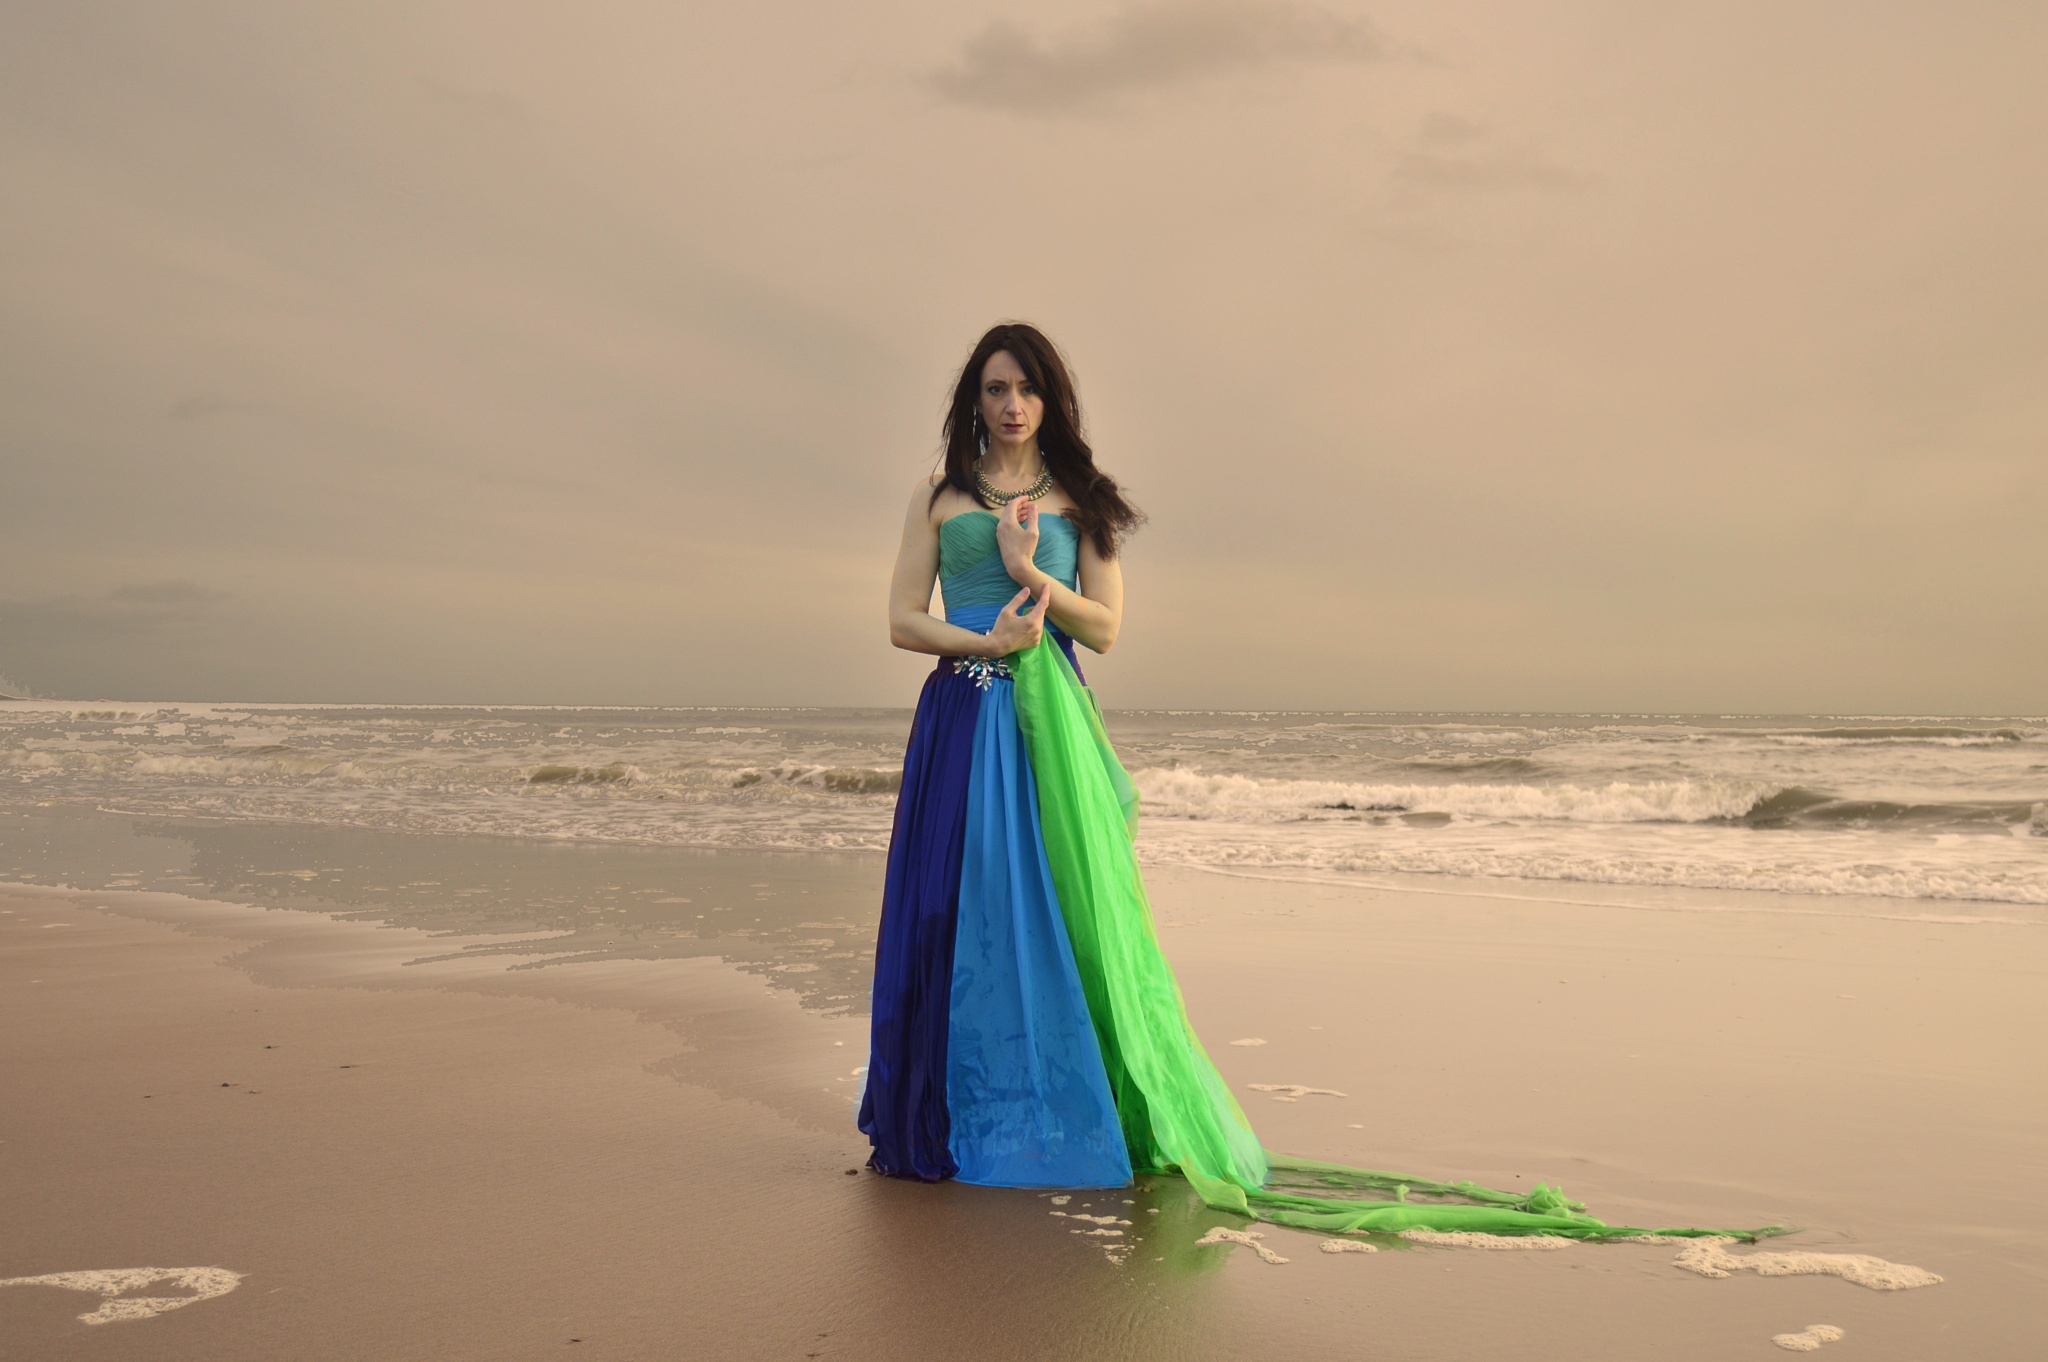 Ocean Queen by John White